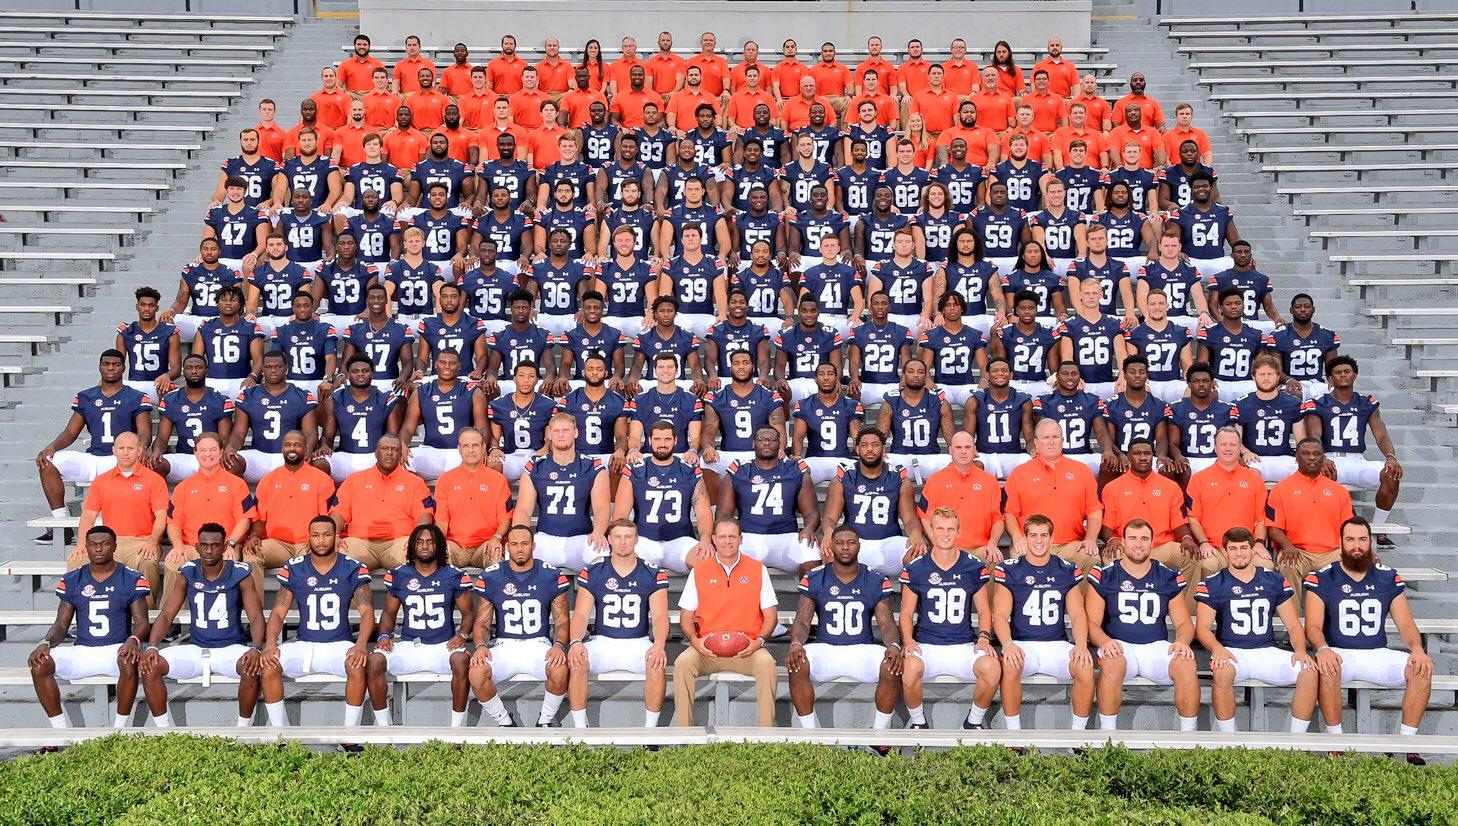 The 2017 Auburn Football Team Picture